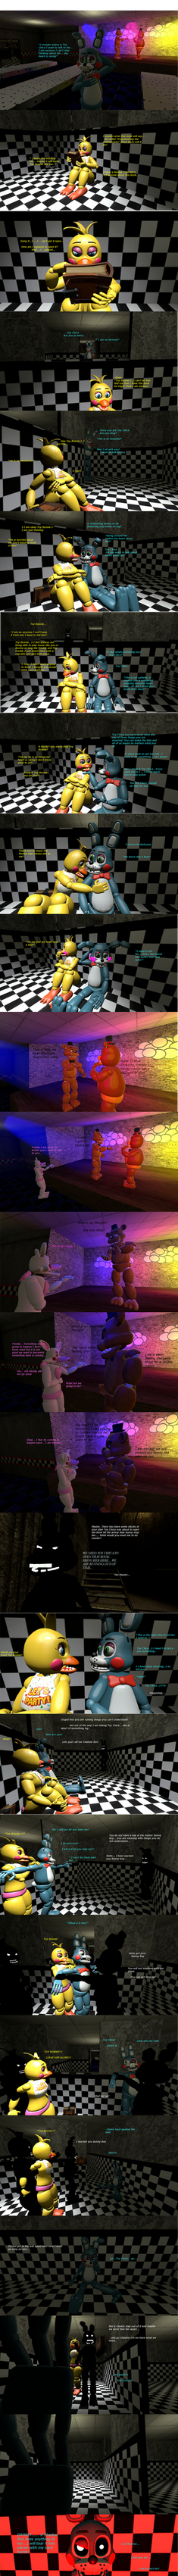 FNAF Story Page 2